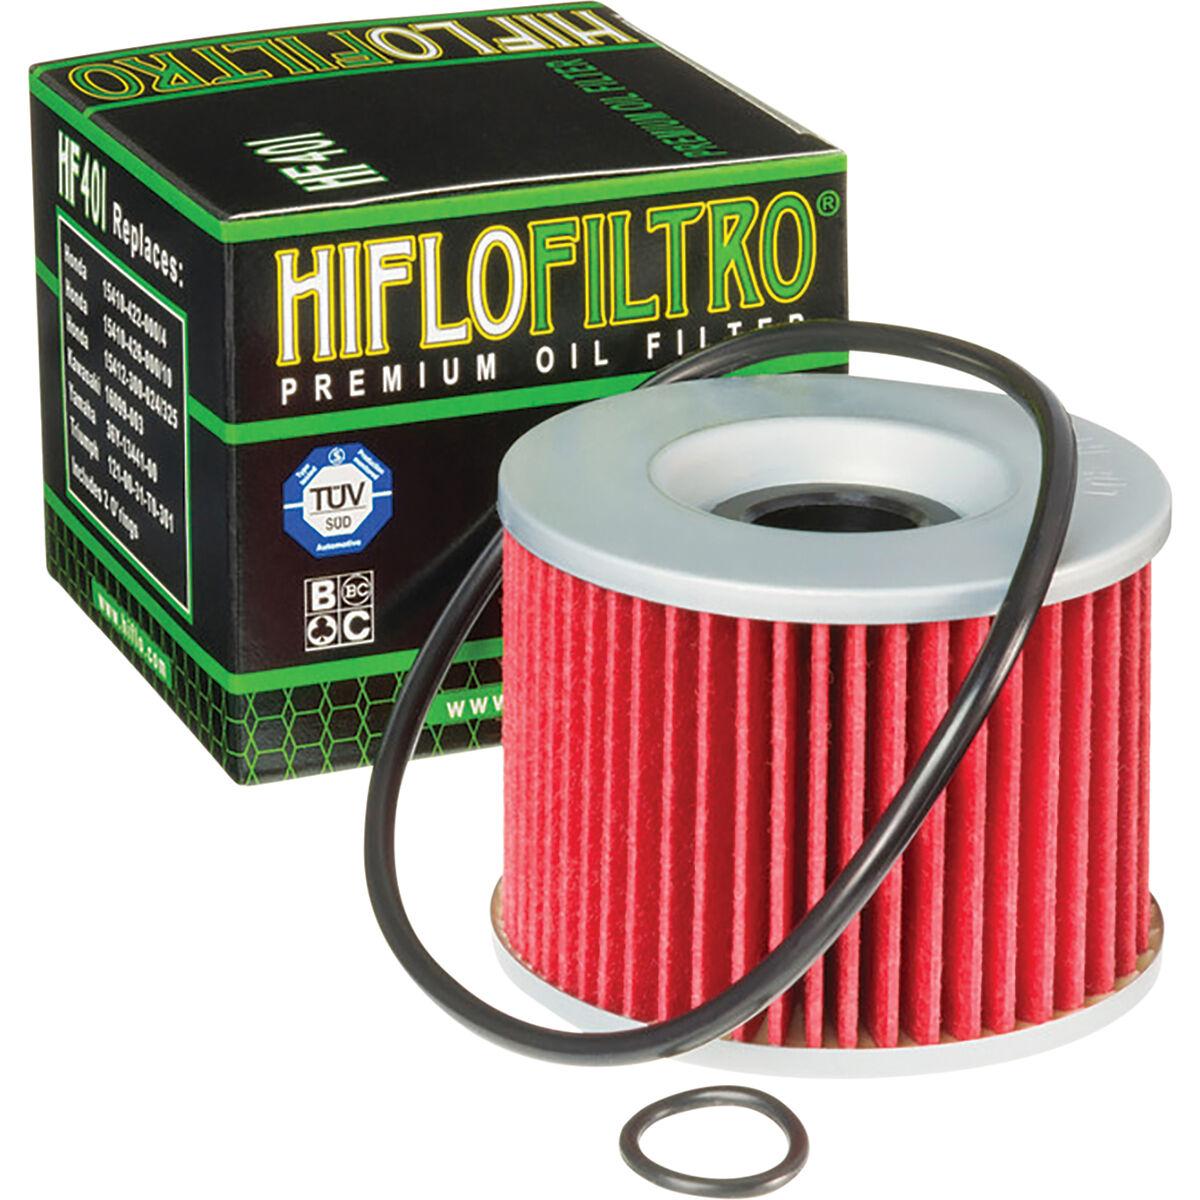 Quantity 2 Hiflo Motorcycle Oil Filter HF401